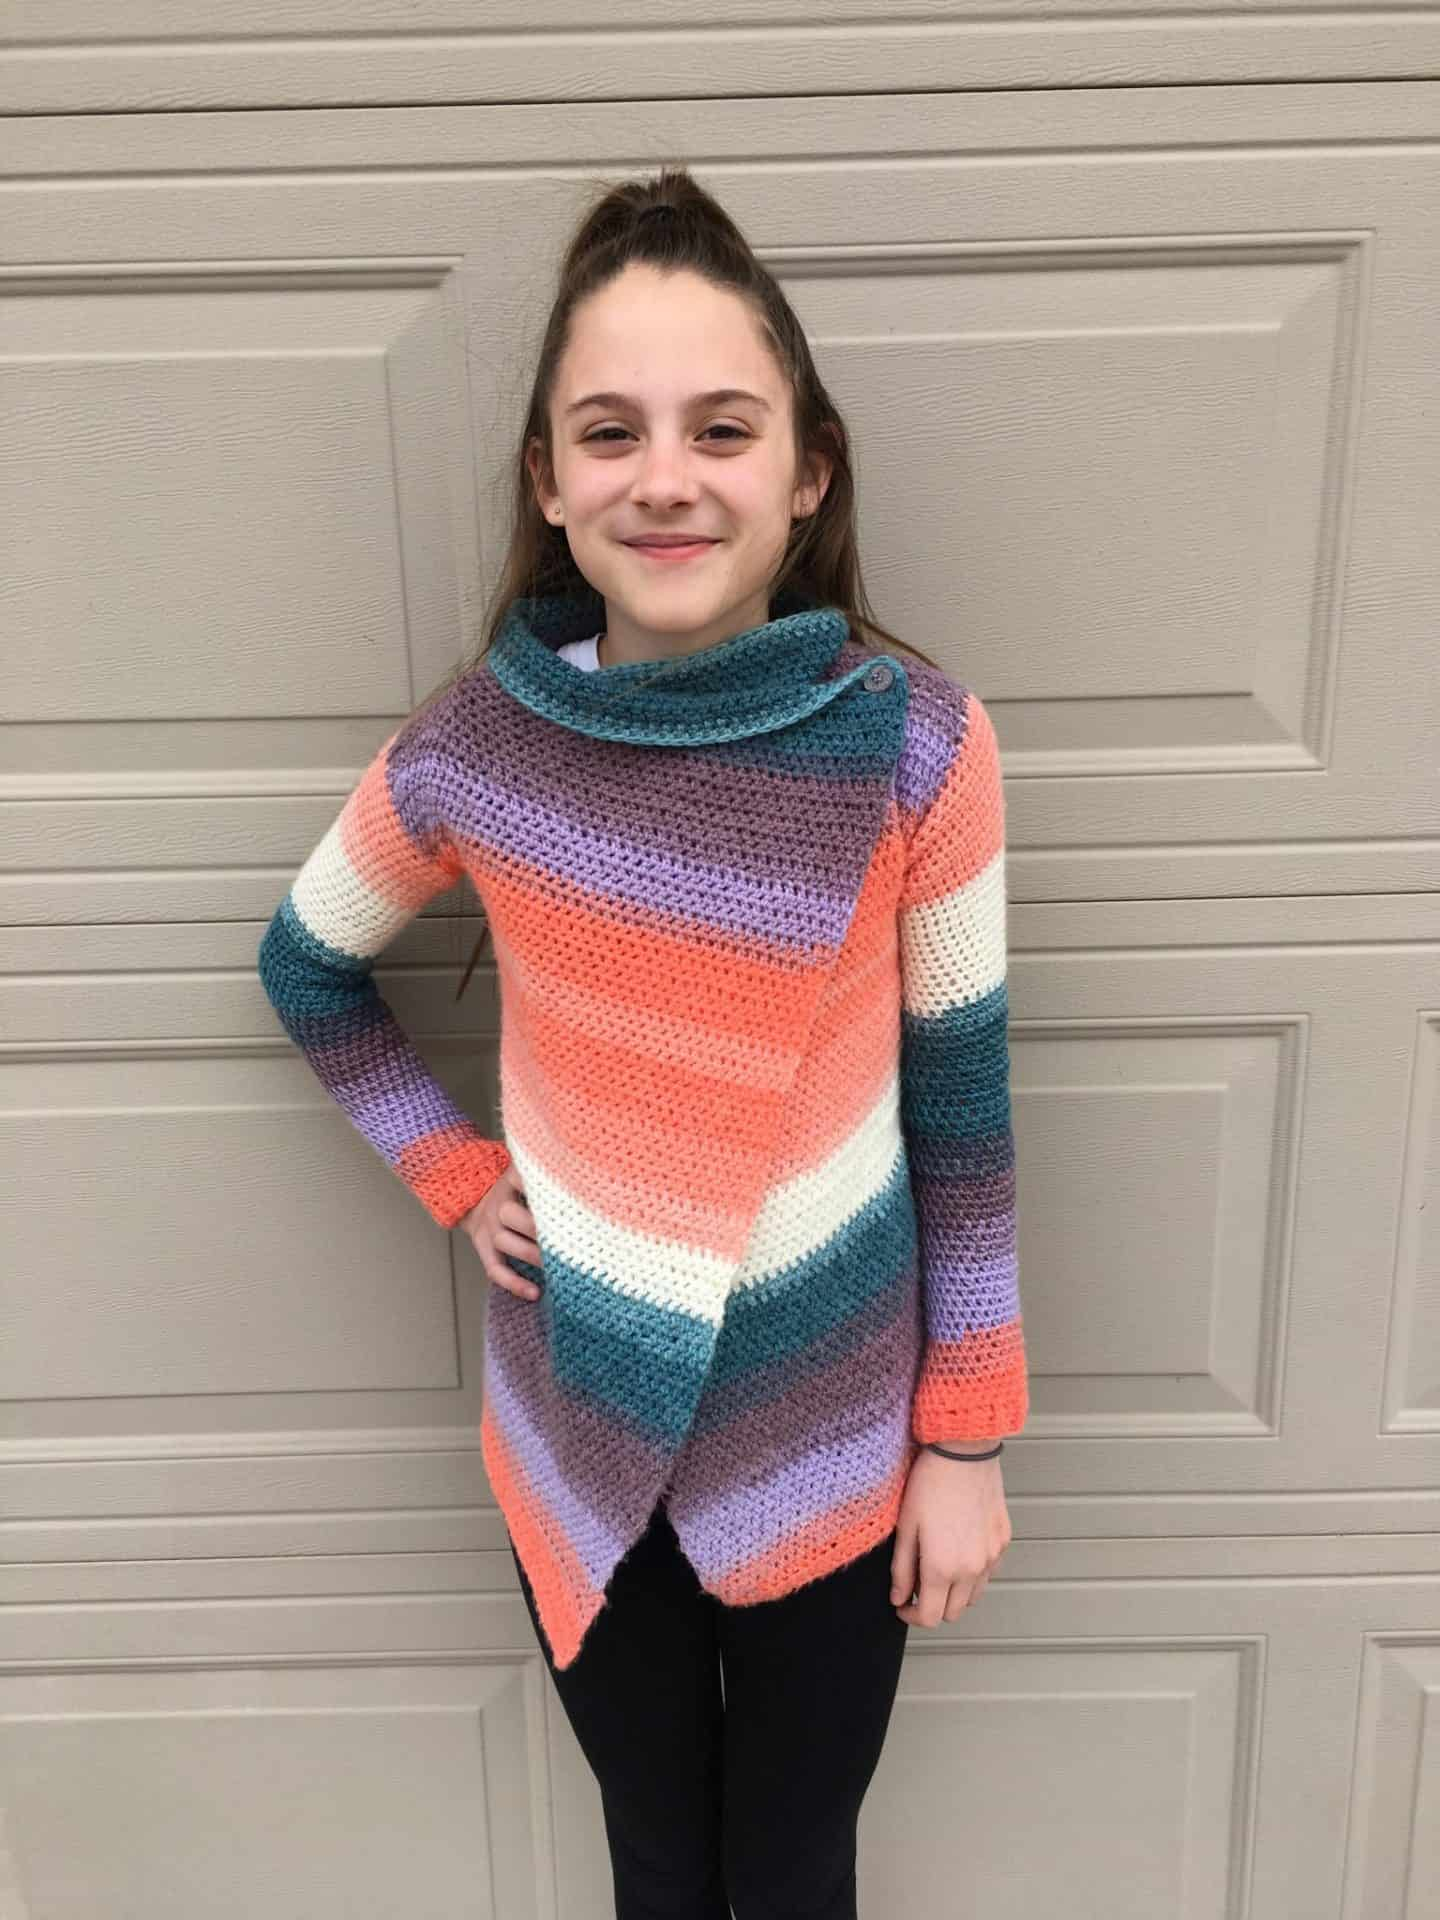 Child Size Blanket Cardigan Free Crochet Pattern Size 12 14